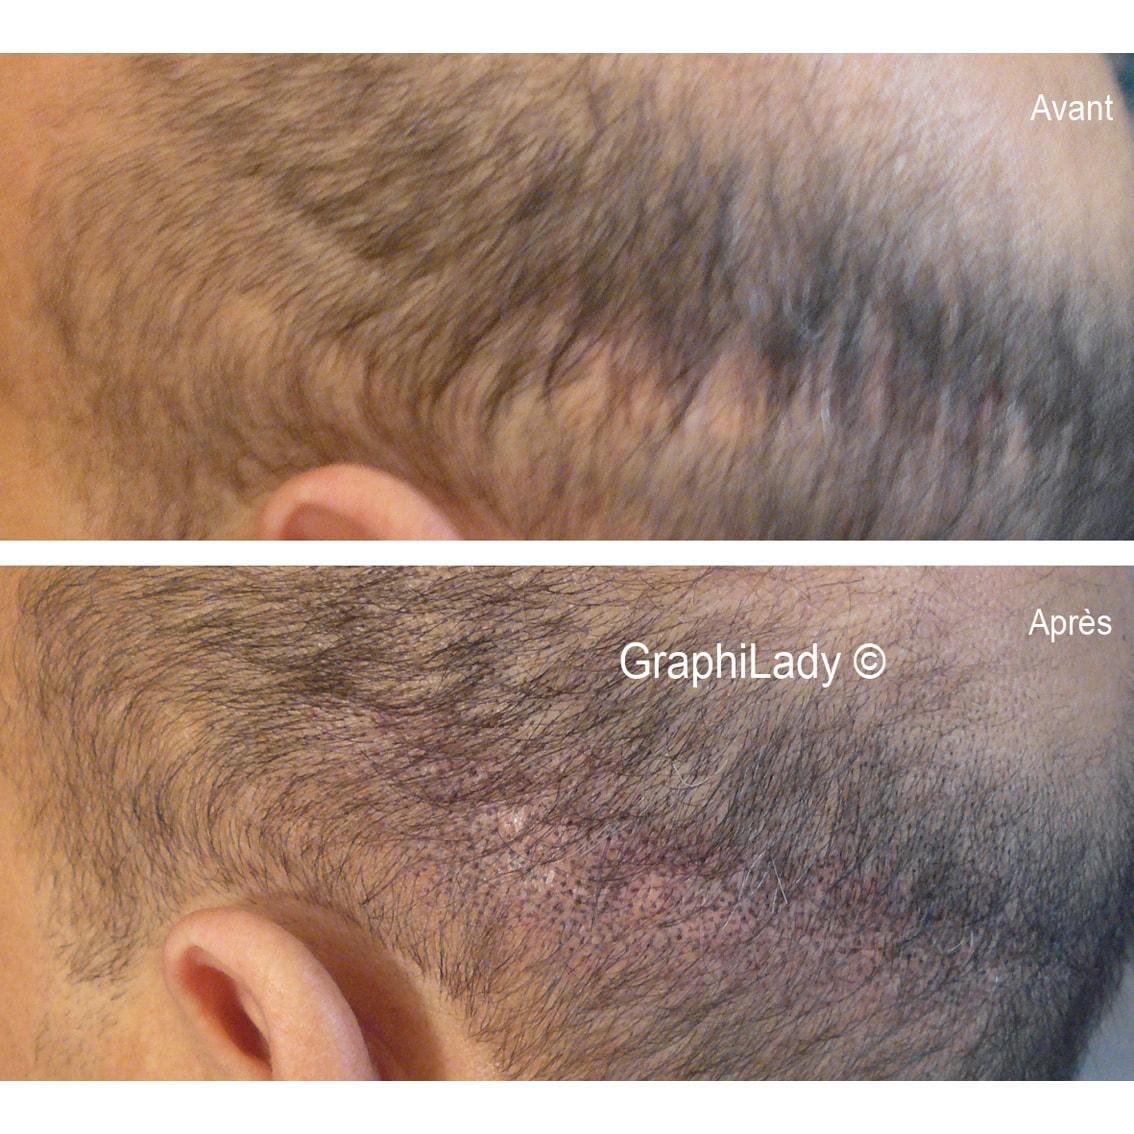 maquillage permanent cicatrice 08